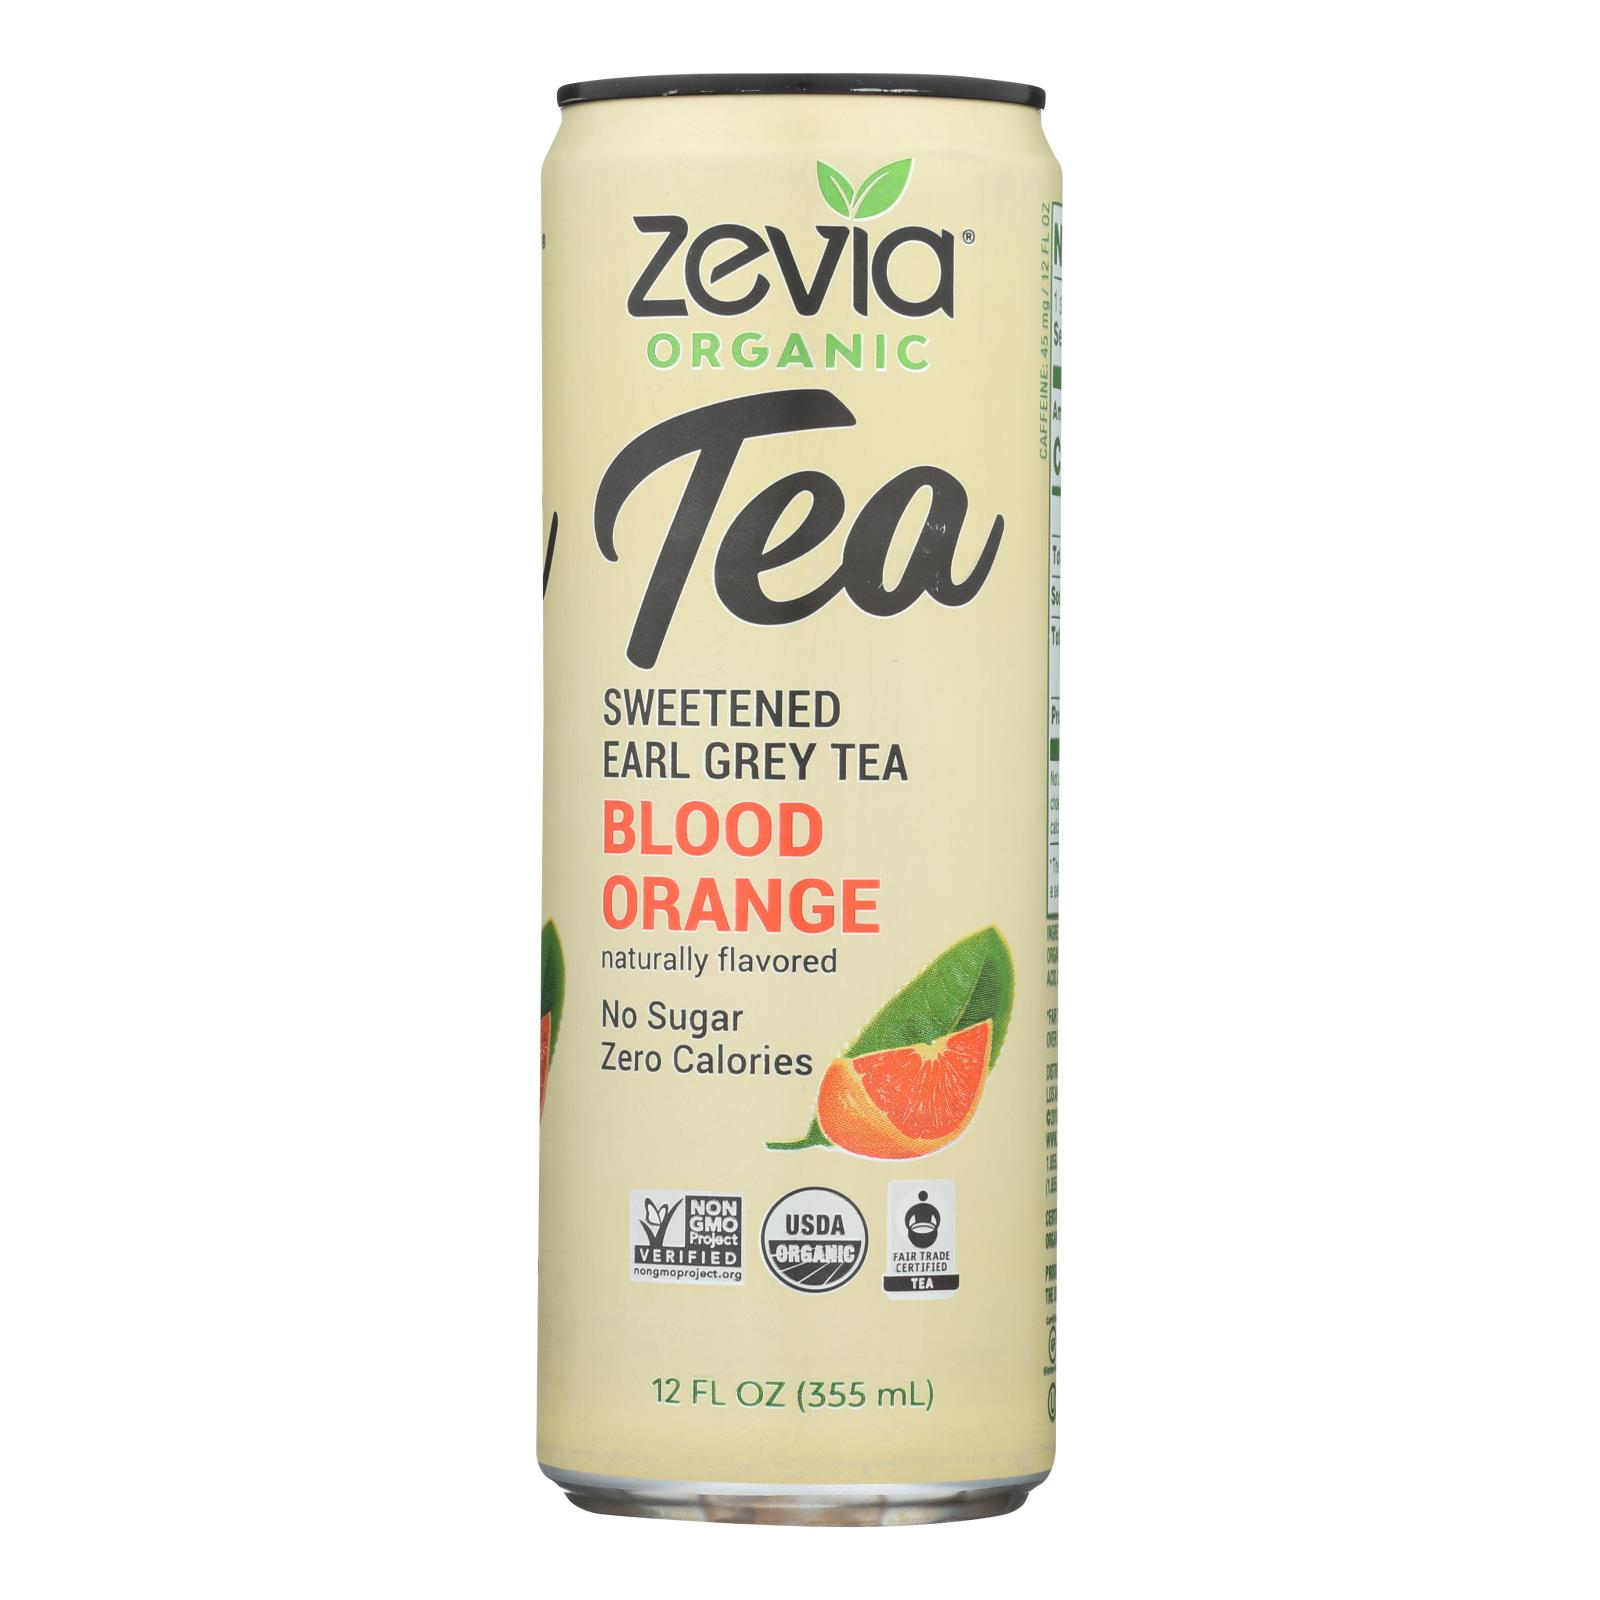 Zevia - Tea Erl Gry Bld Orange - Case of 12 - 12 FZ